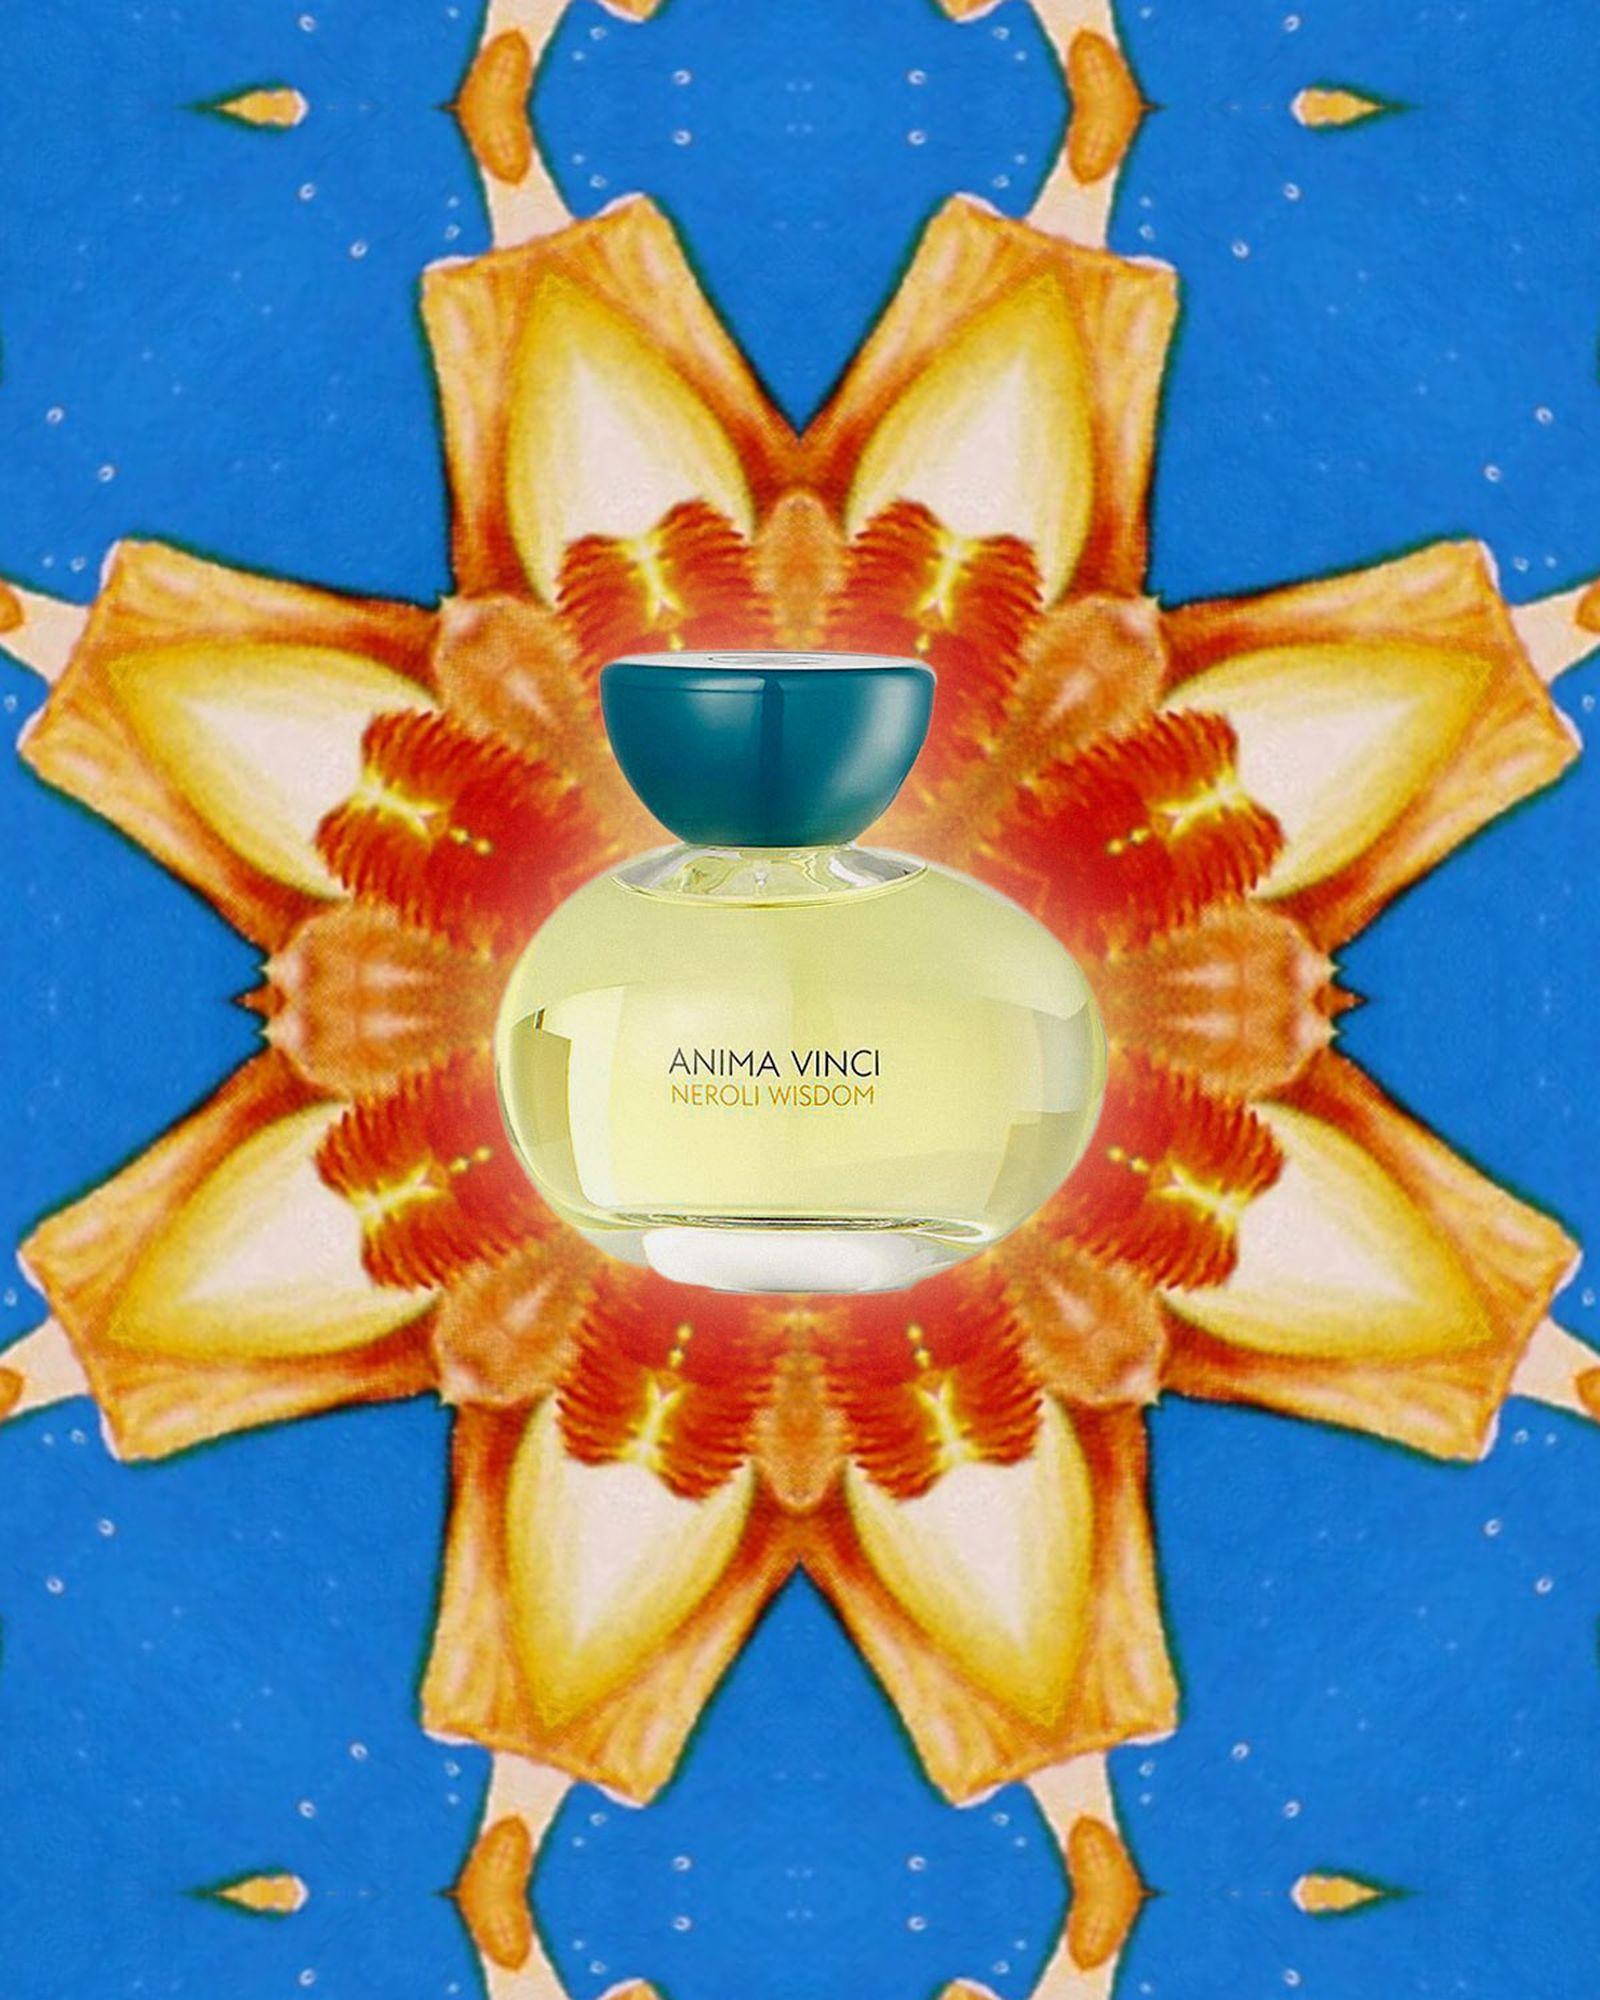 200825_ED_SER_TheMaterialist_Perfume_Fresh_AnimaVinci_1200x1500